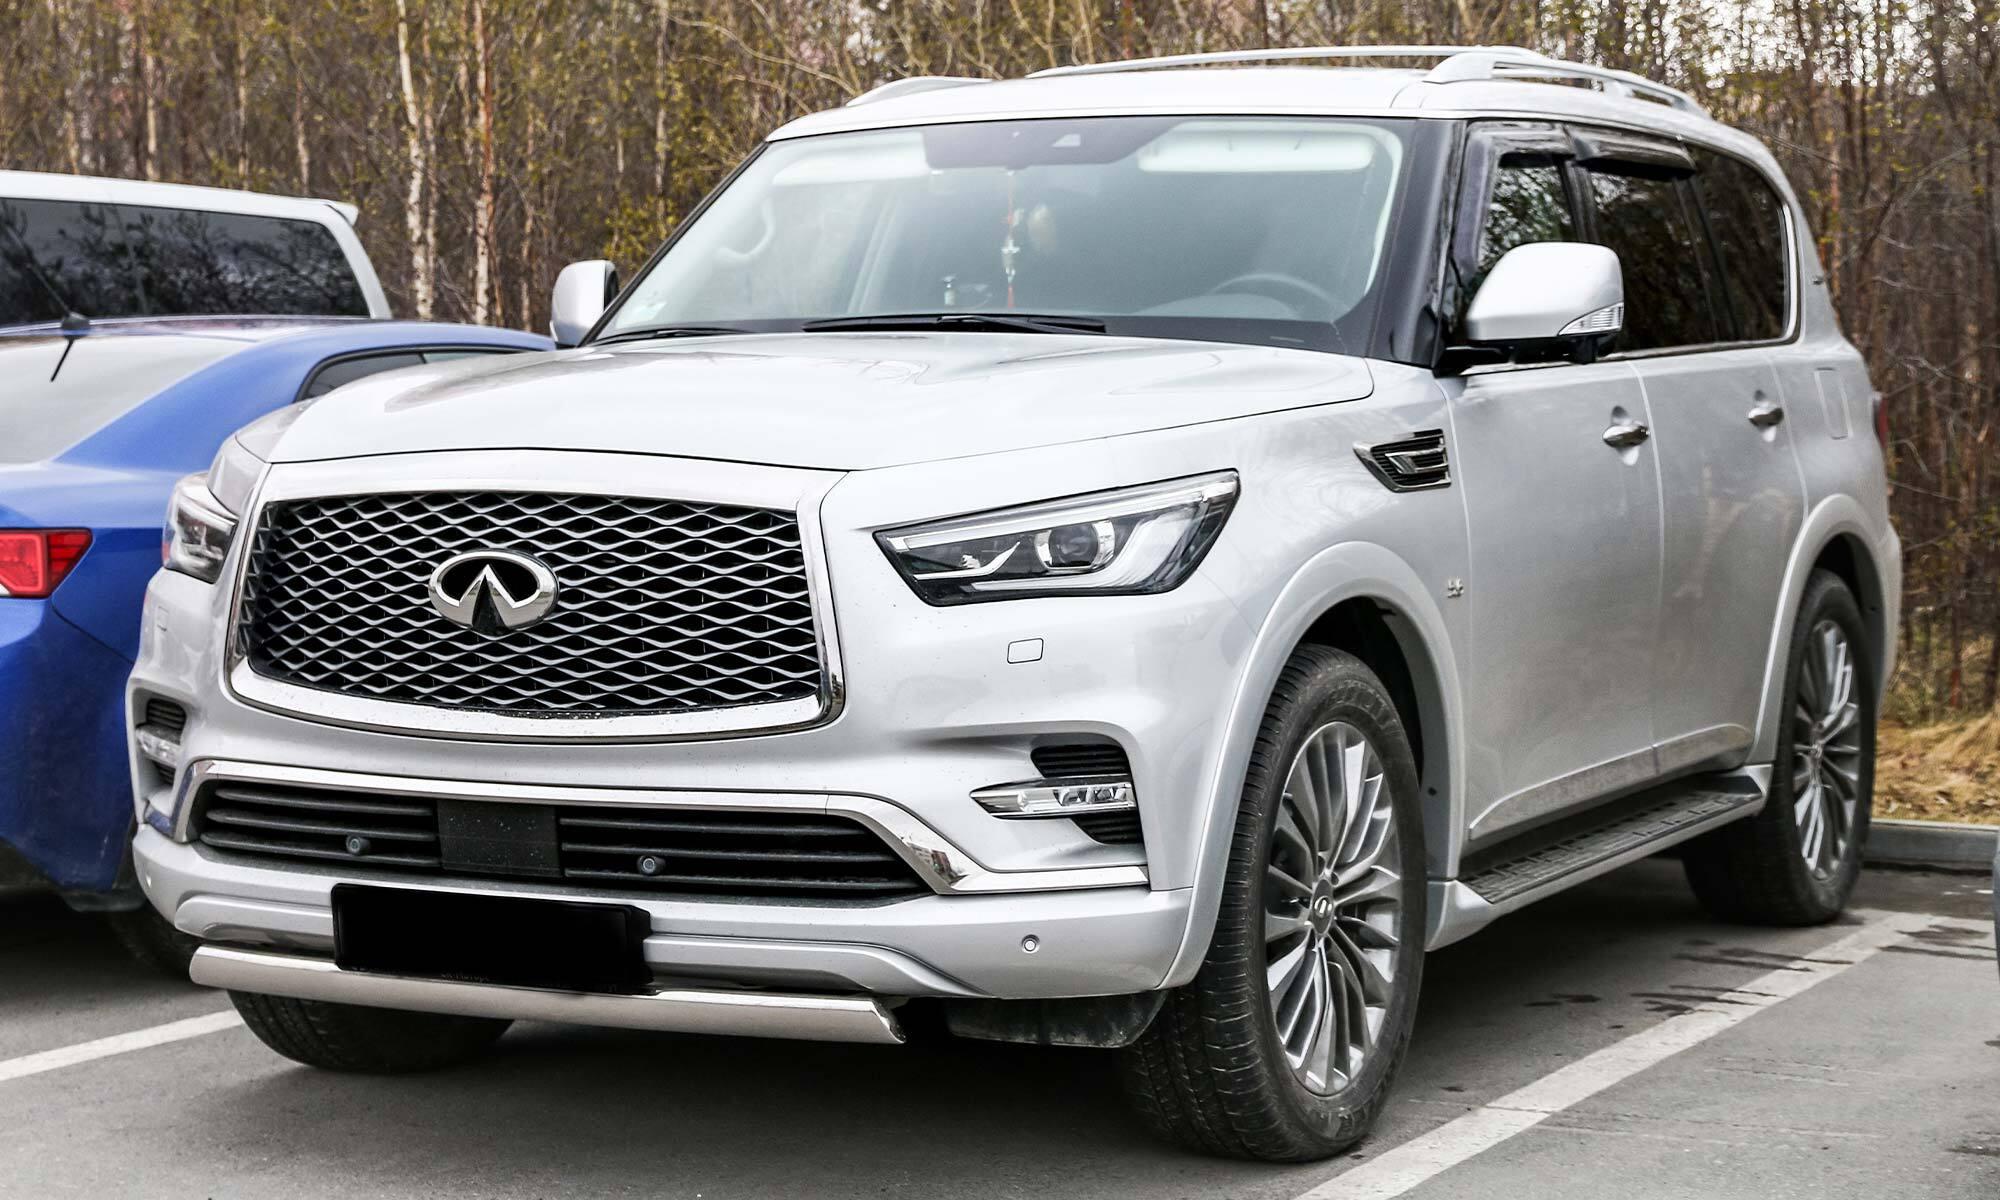 A picture of a silver 2019 Infiniti QX80 car in a parking spot.